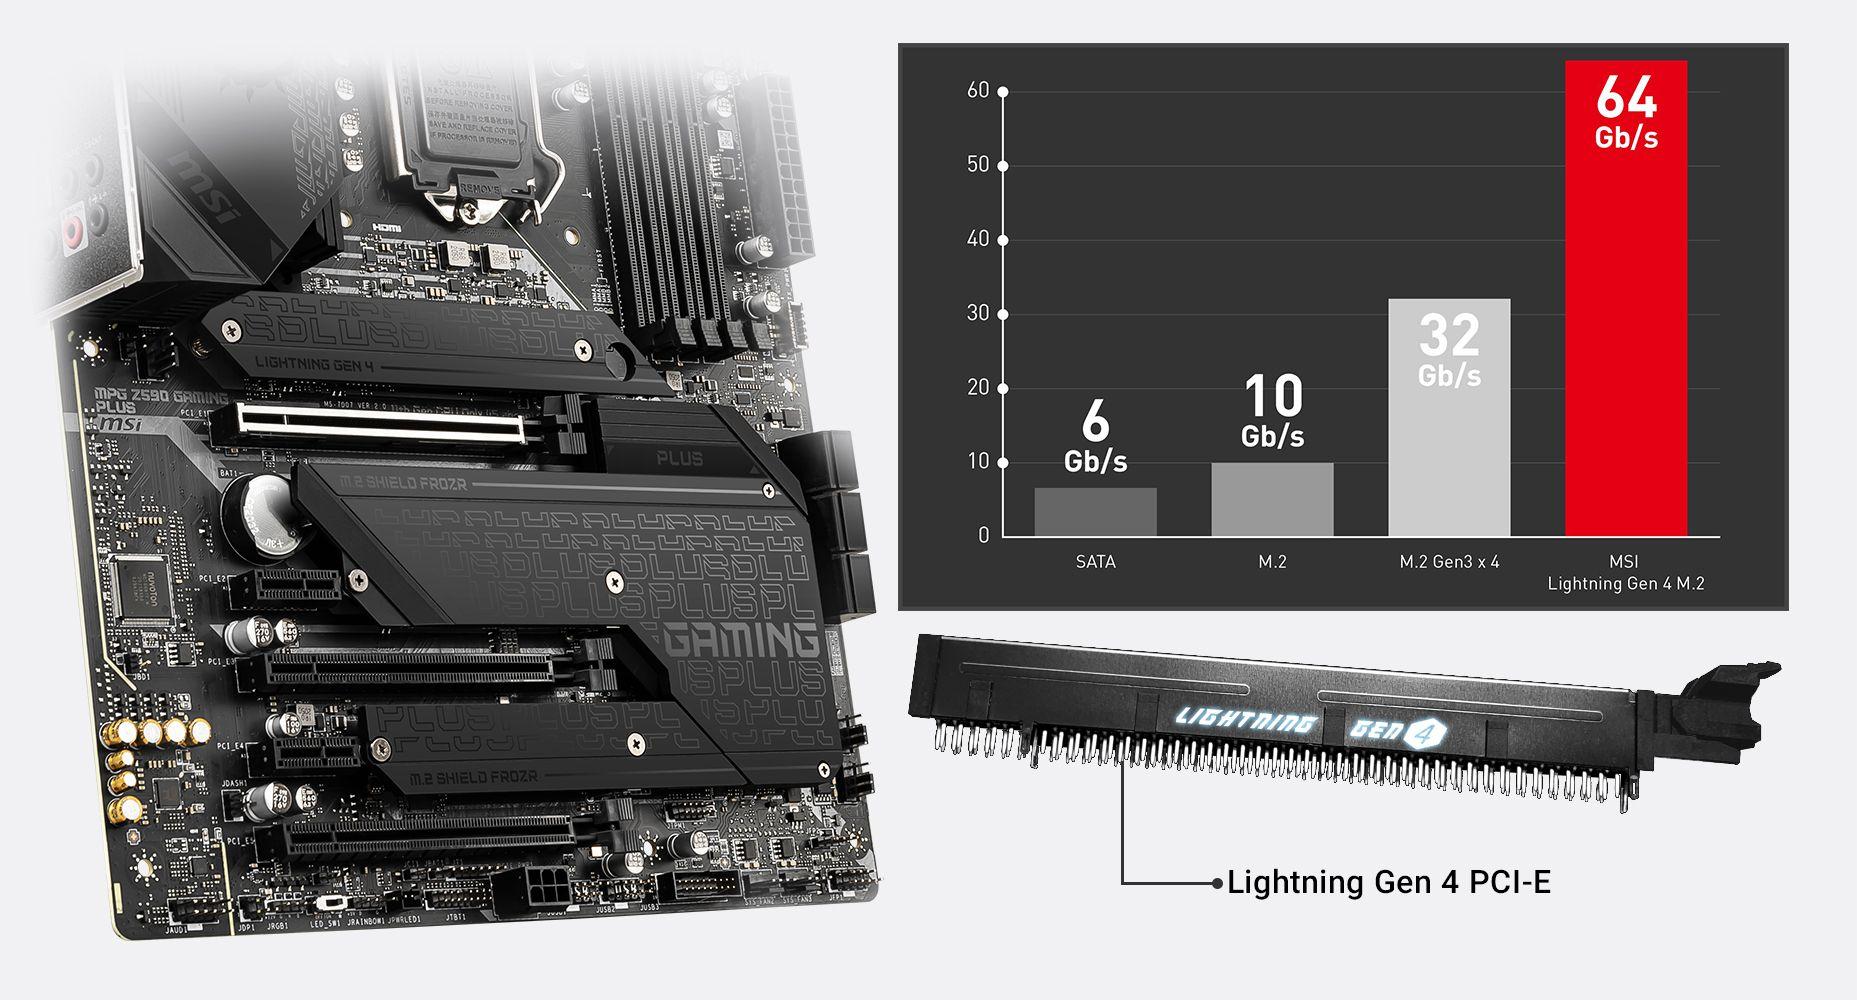 MSI MPG Z590 GAMING PLUS LIGHTNING GEN 4